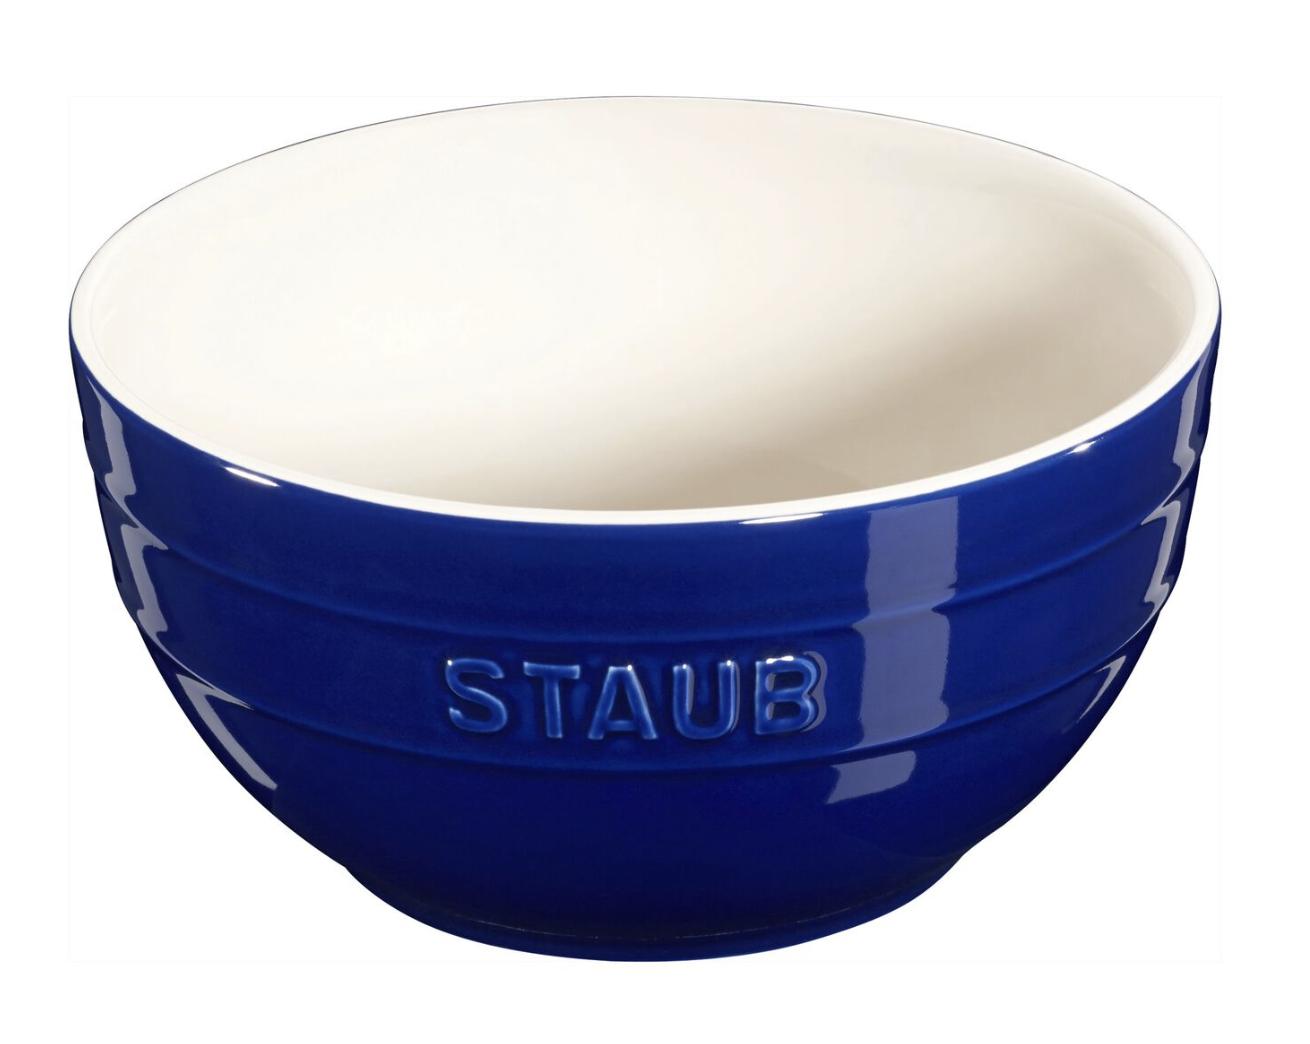 "Staub Ceramic Bowl Set/2, 17cm/6.5"" diameter"